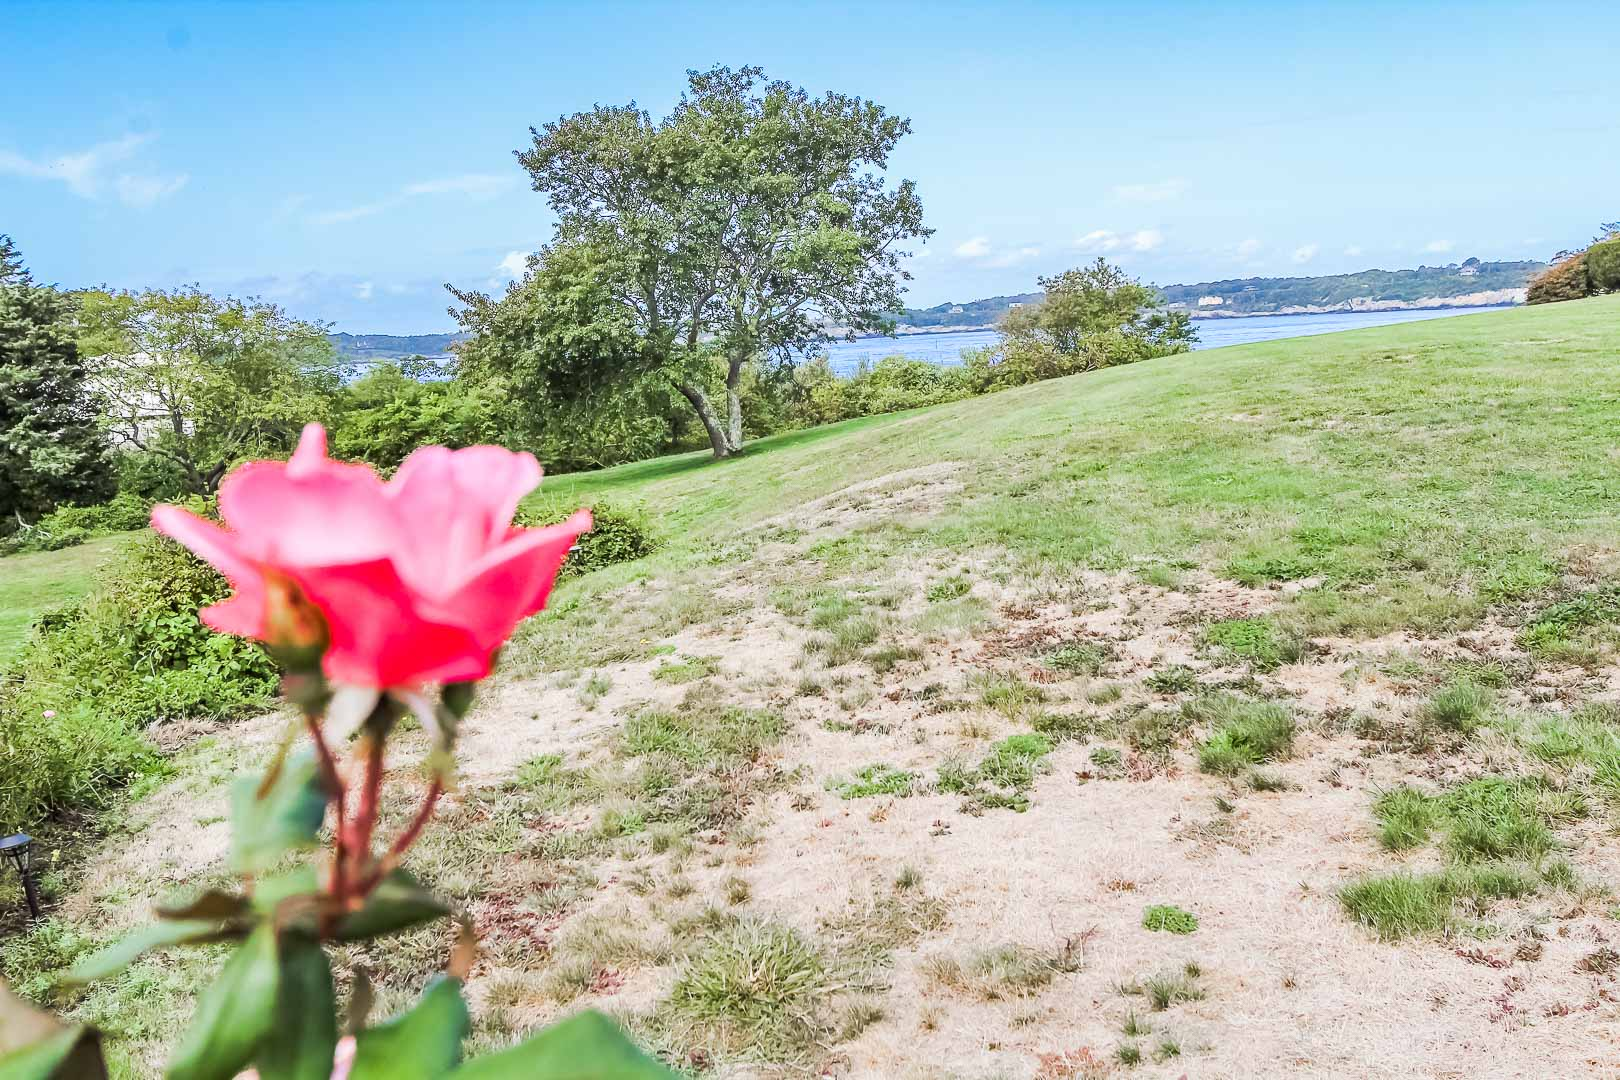 A tranqui view from VRI's Oceancliff Resort in Rhode Island.